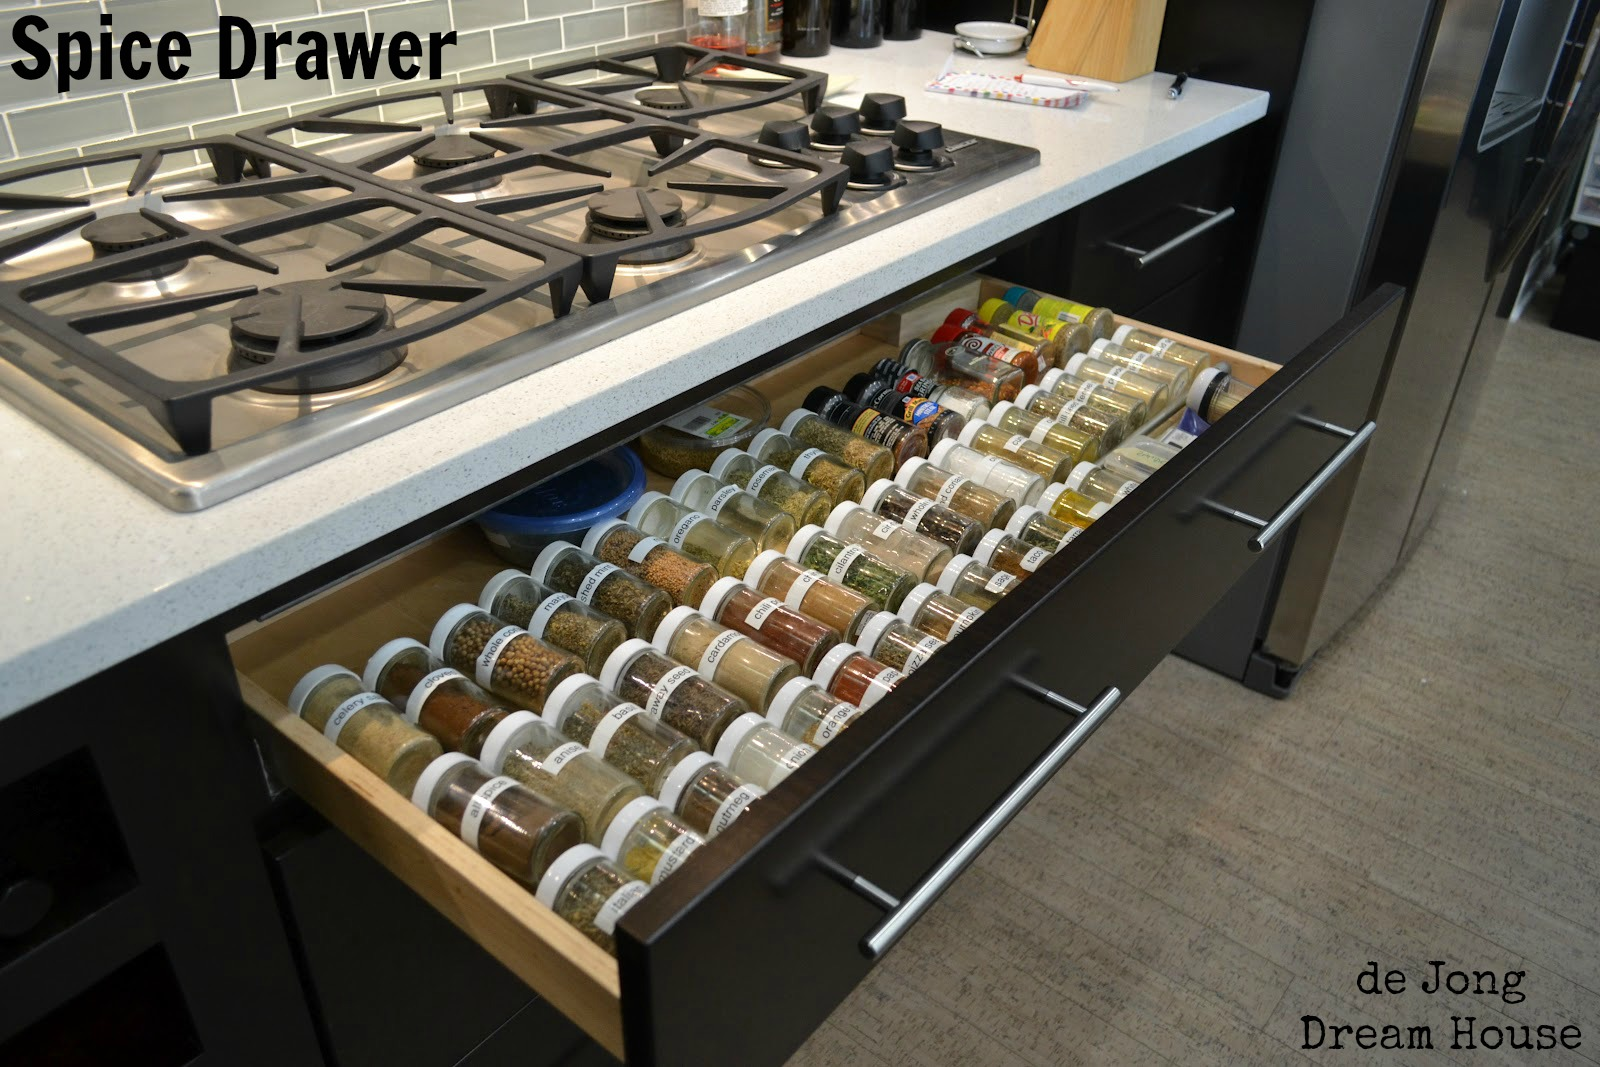 de Jong Dream House: Spice Drawer